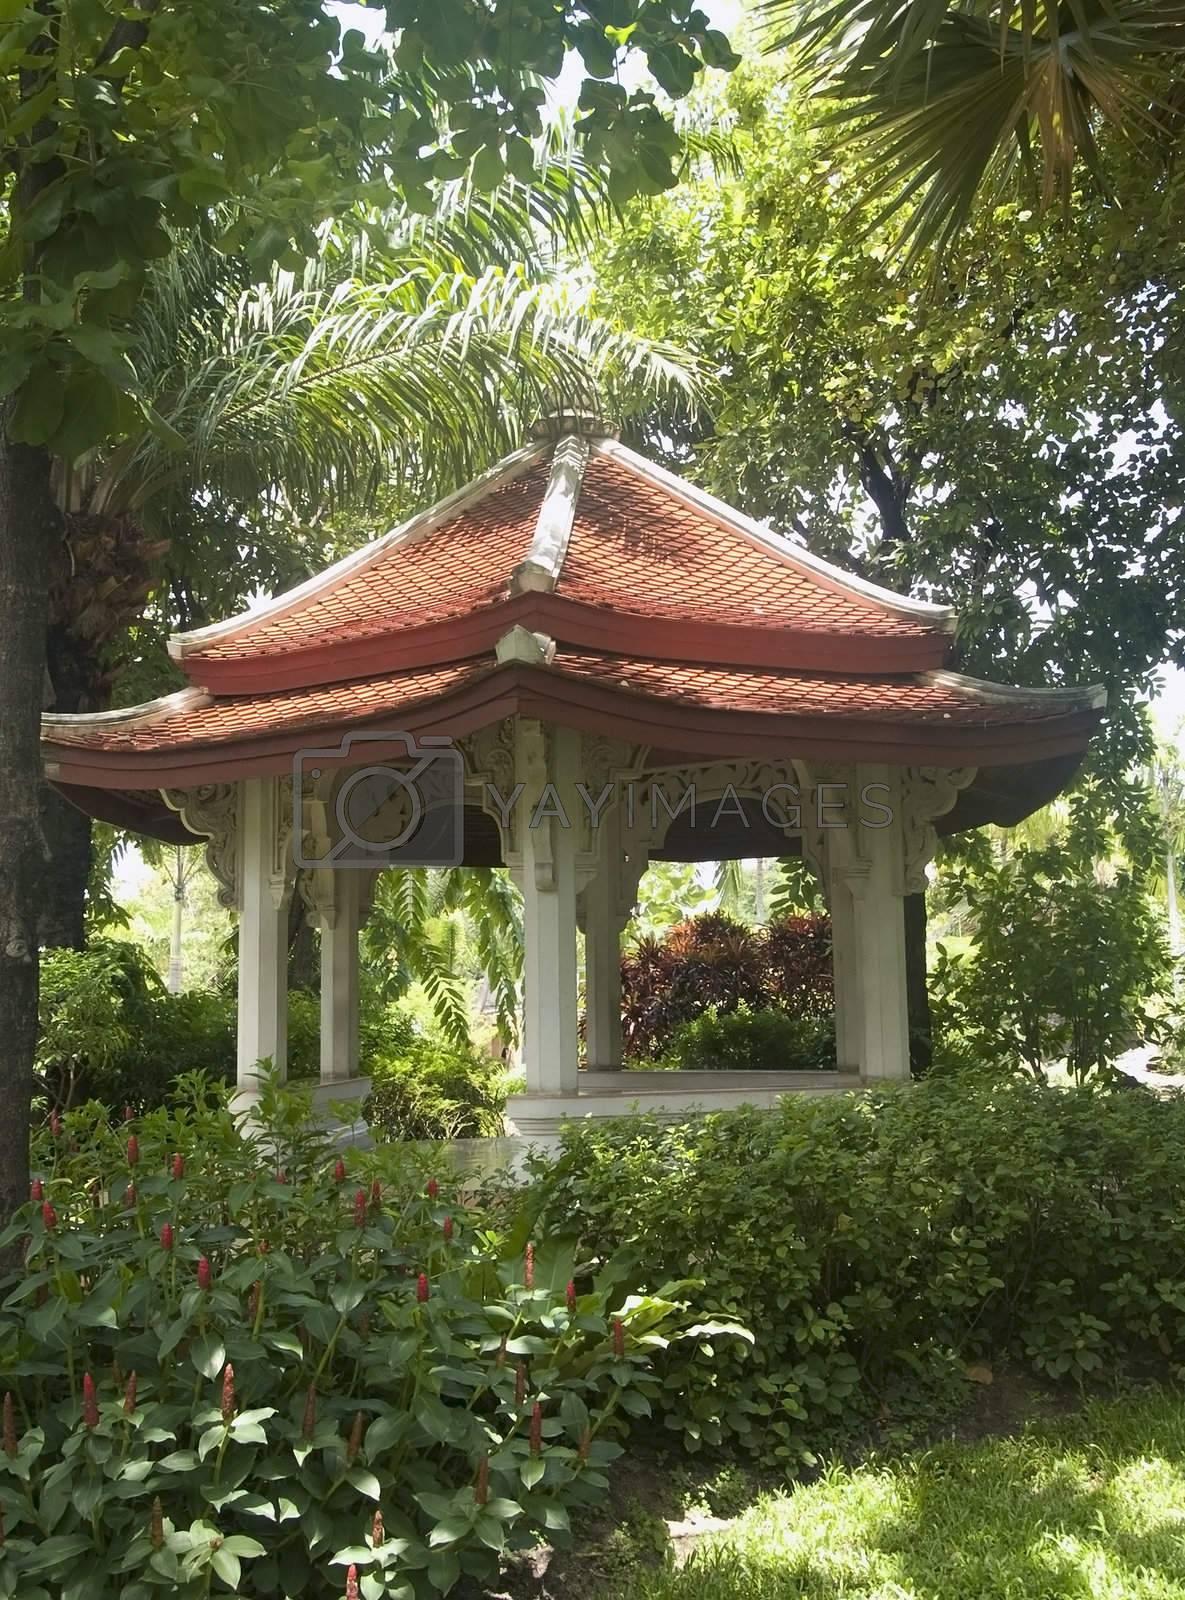 Pavilion in a tropical garden by epixx